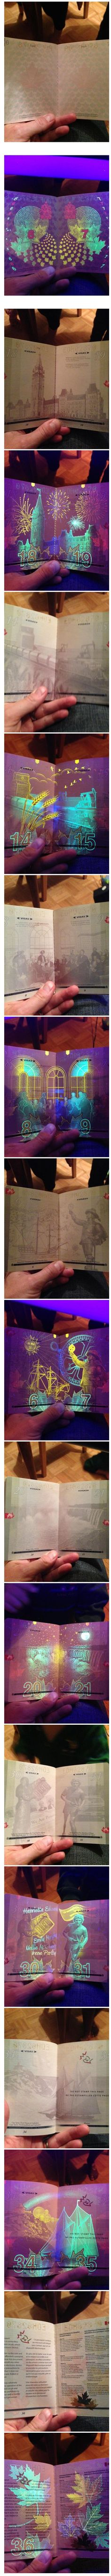 Passaporte canadiense sobre luz violeta